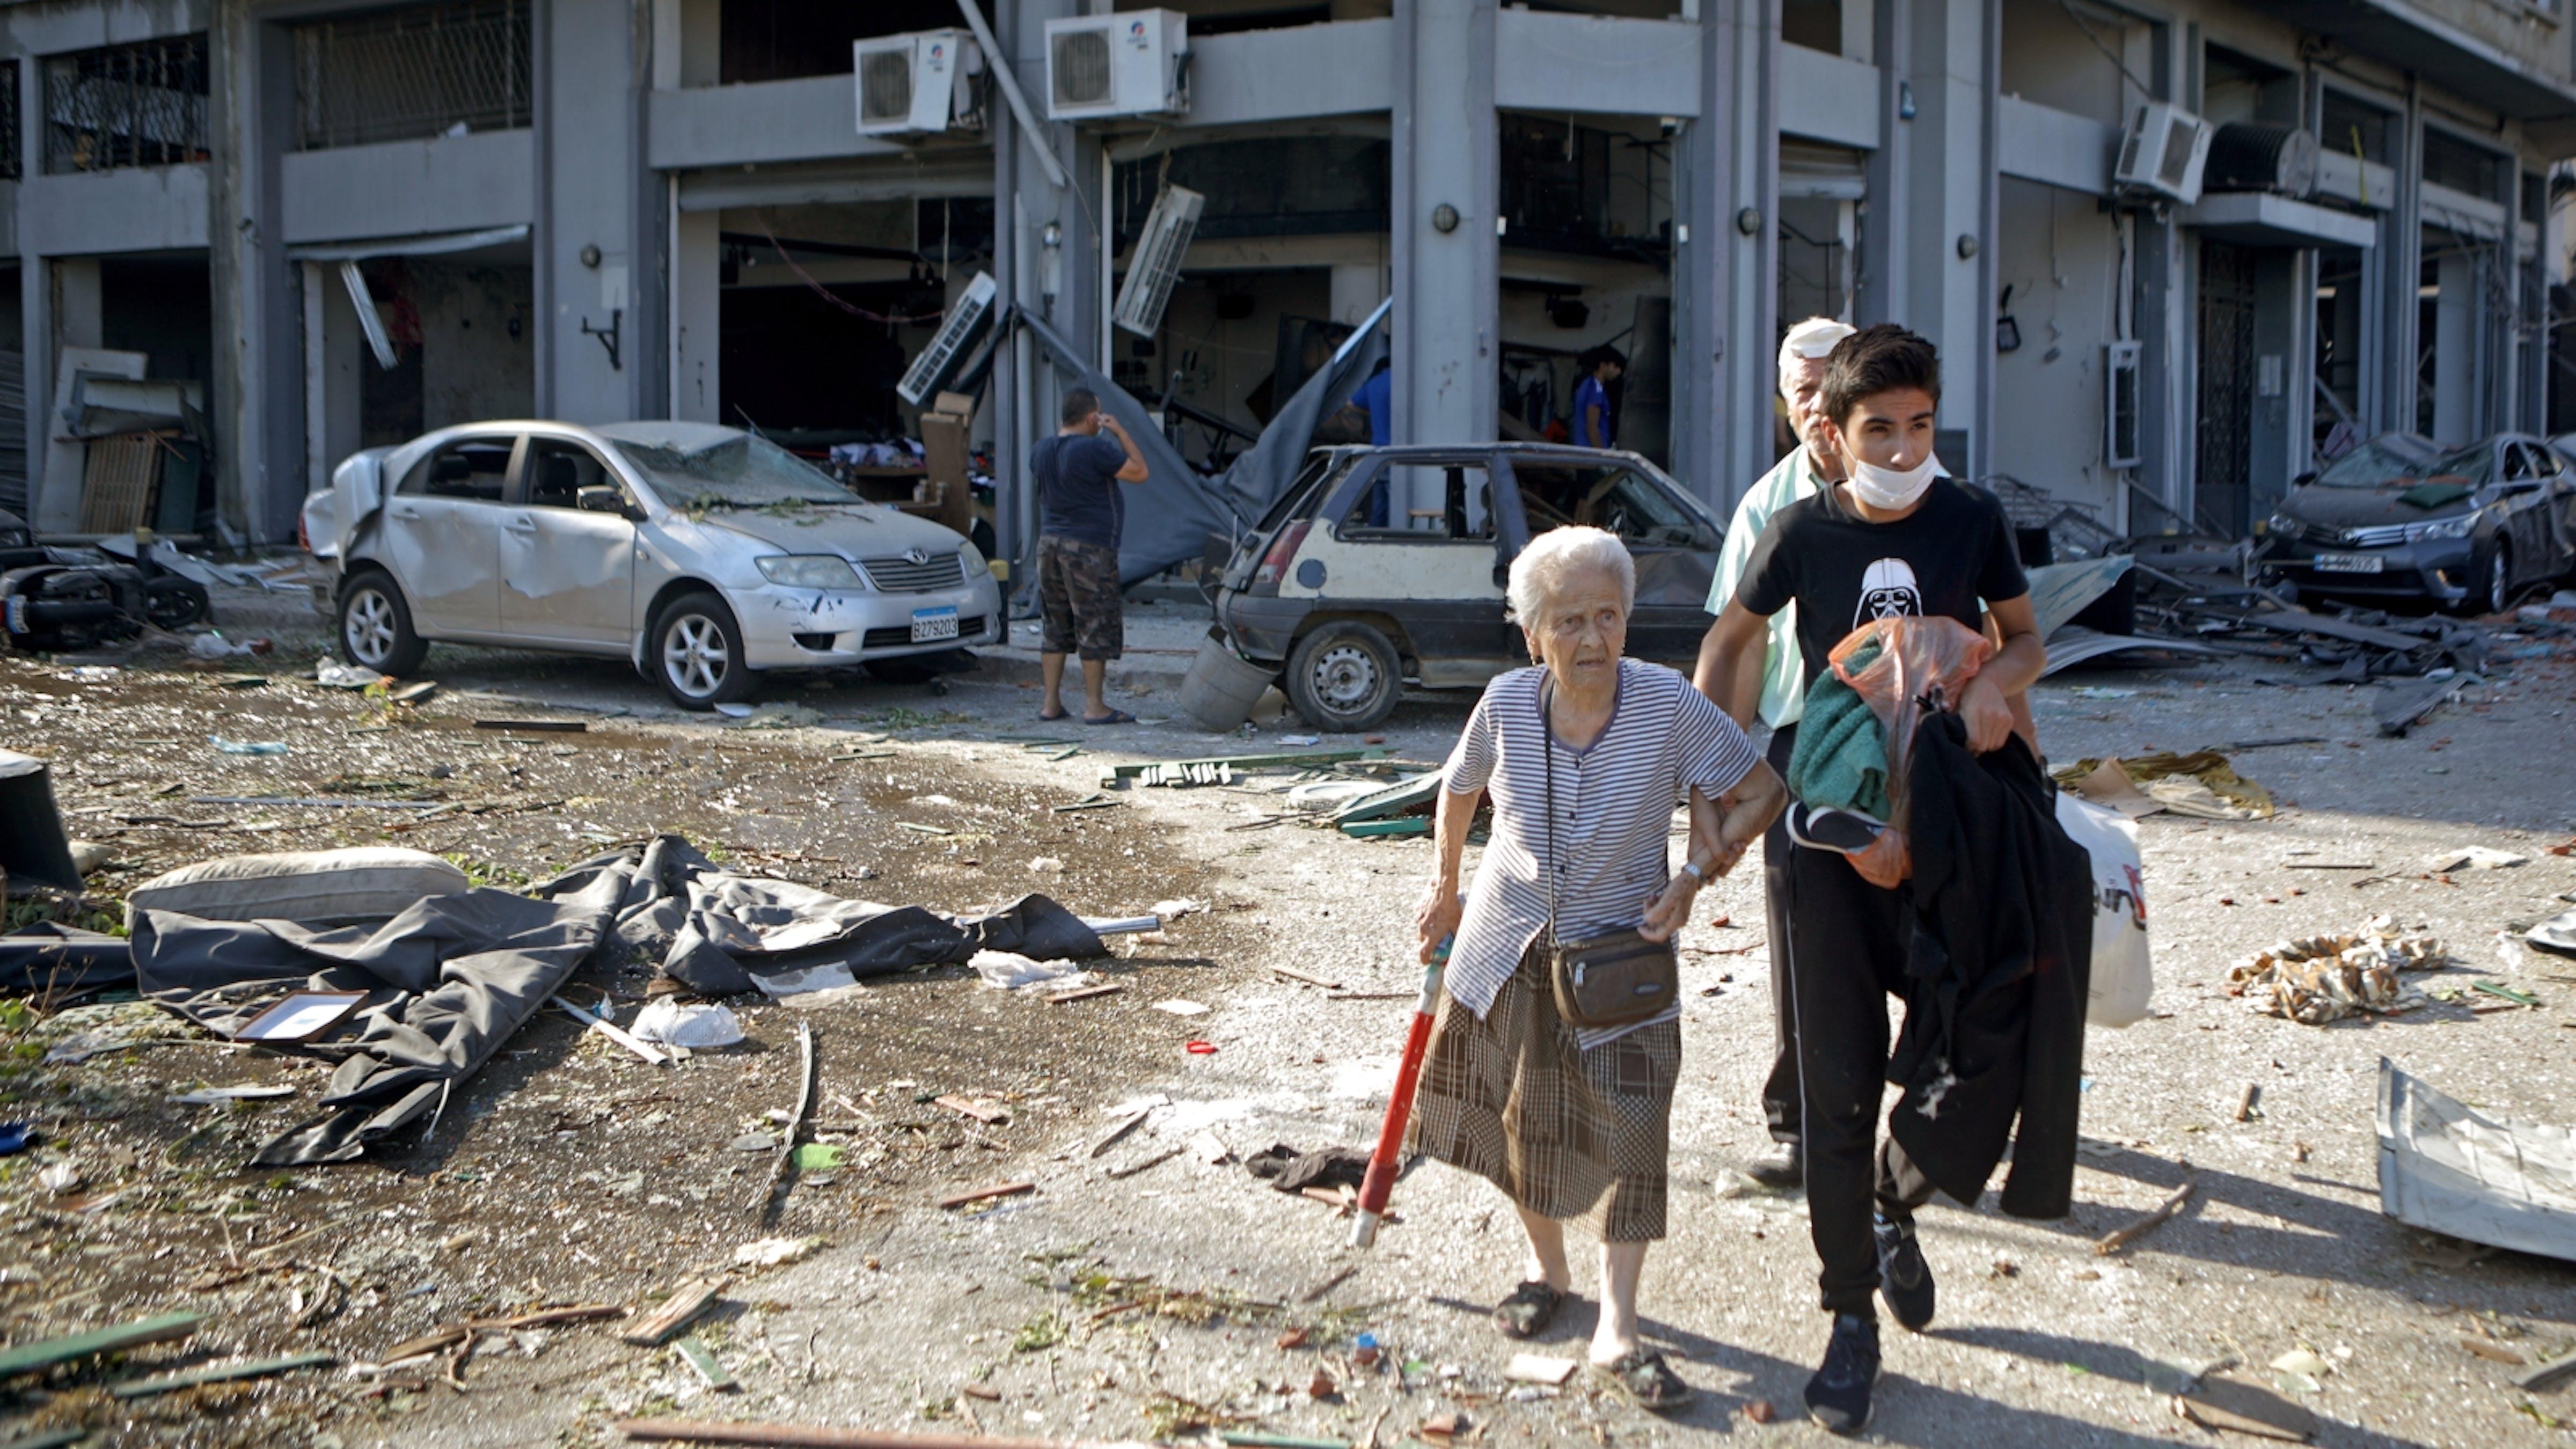 Libano, Beirut devastata dalle esplosioni